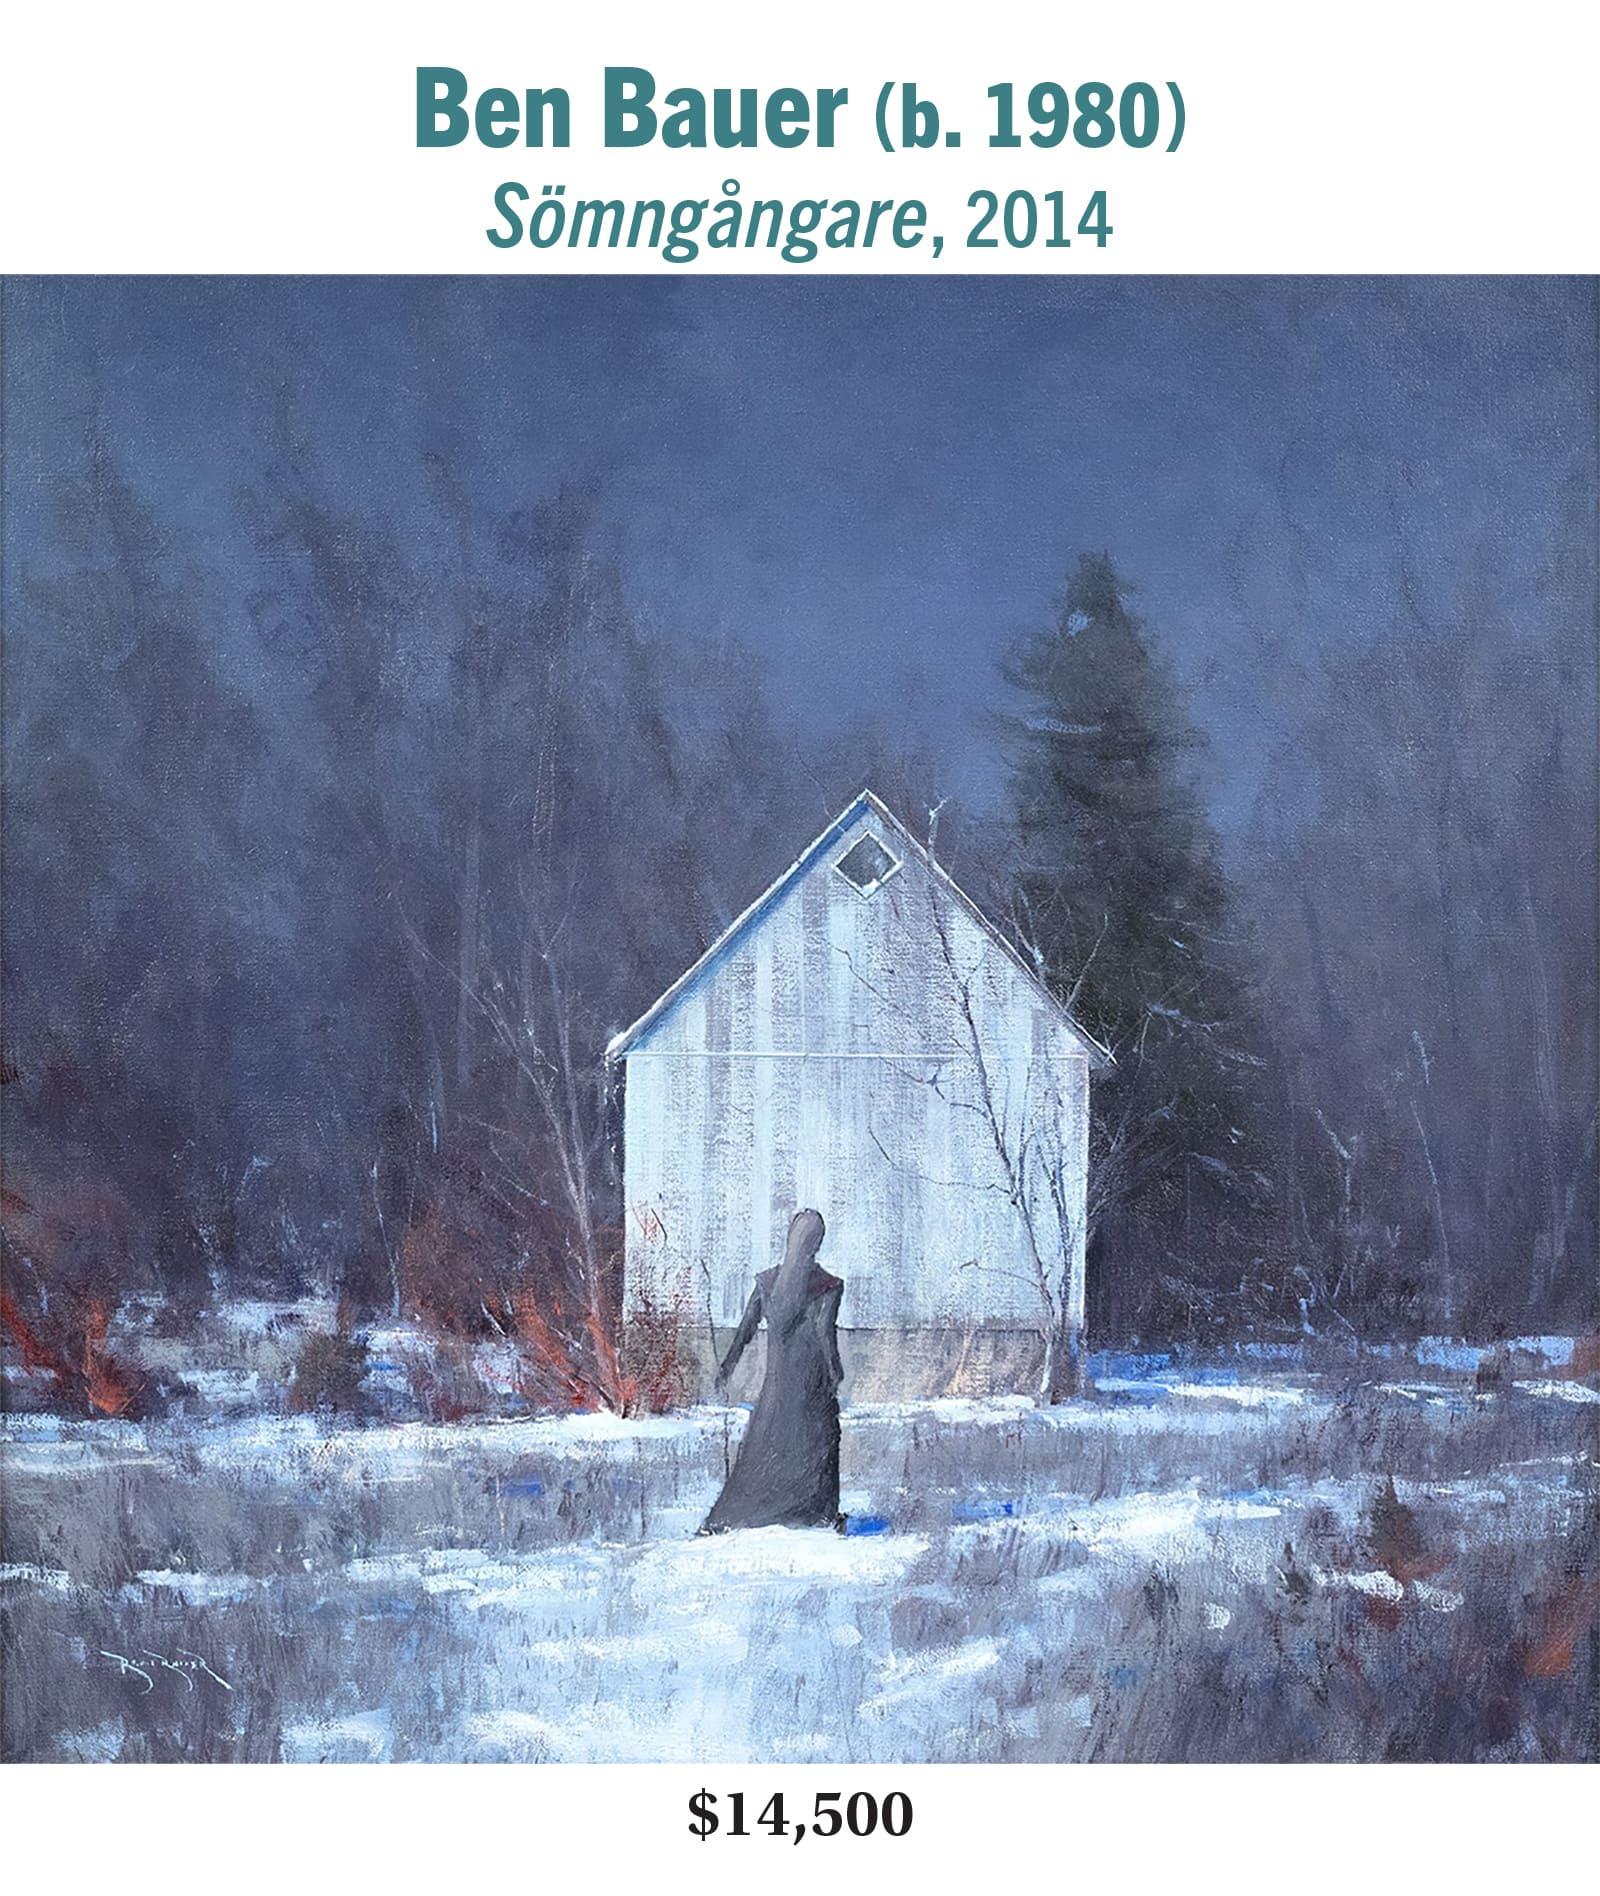 Ben Bauer (b. 1980), Sömngångare, 2014, oil on linen, American contemporary landscape painting